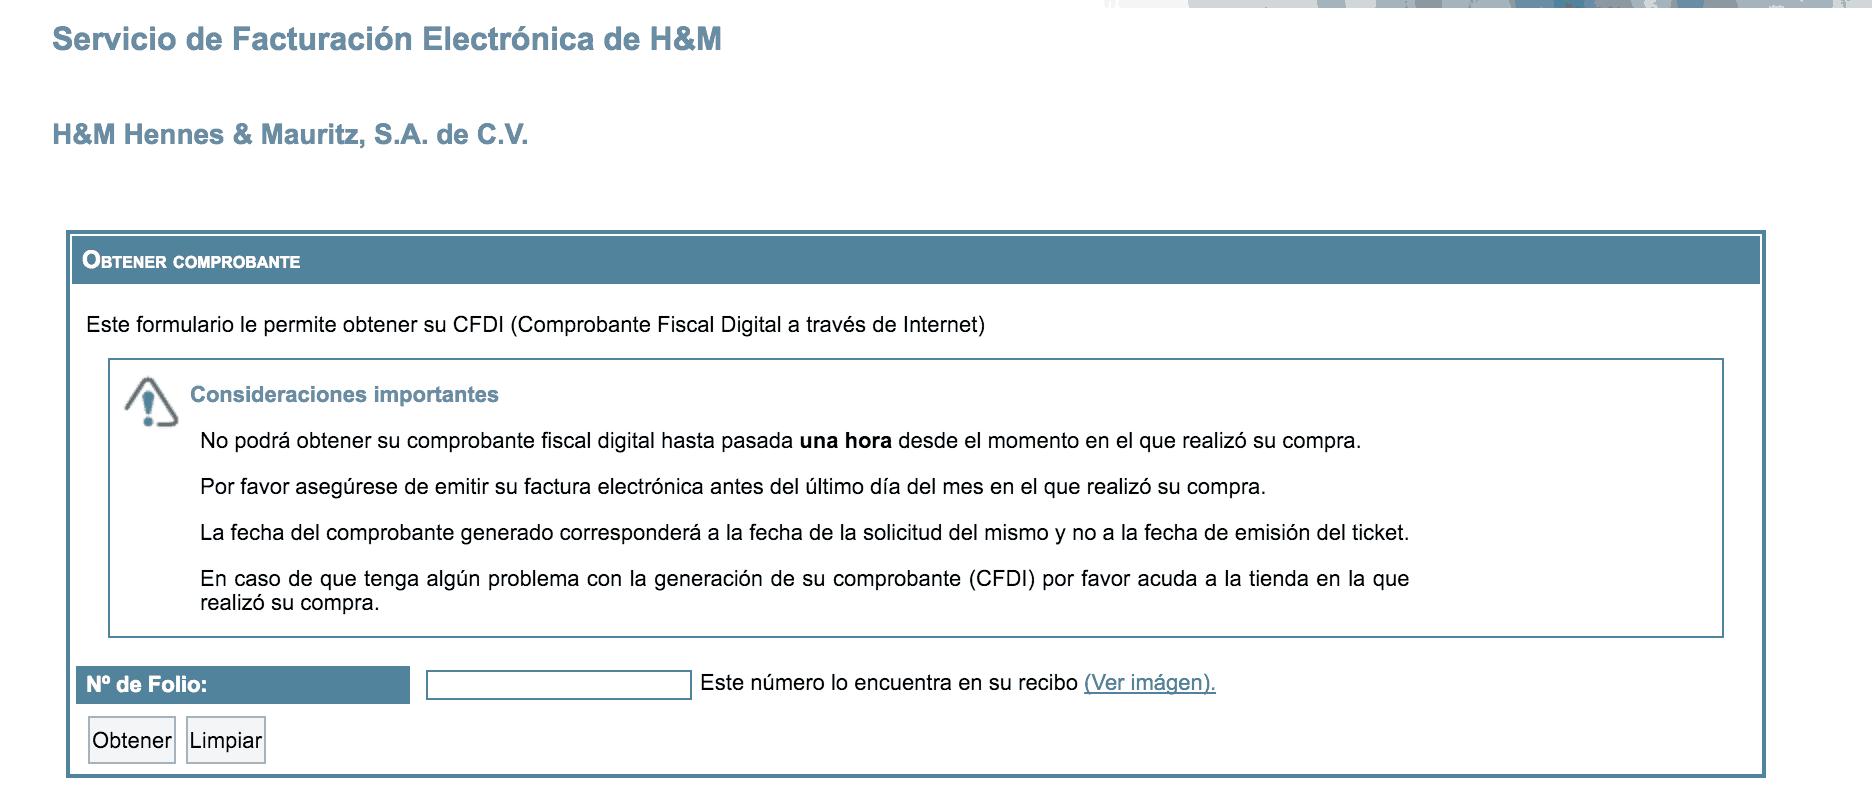 H&M FACTURACION 0